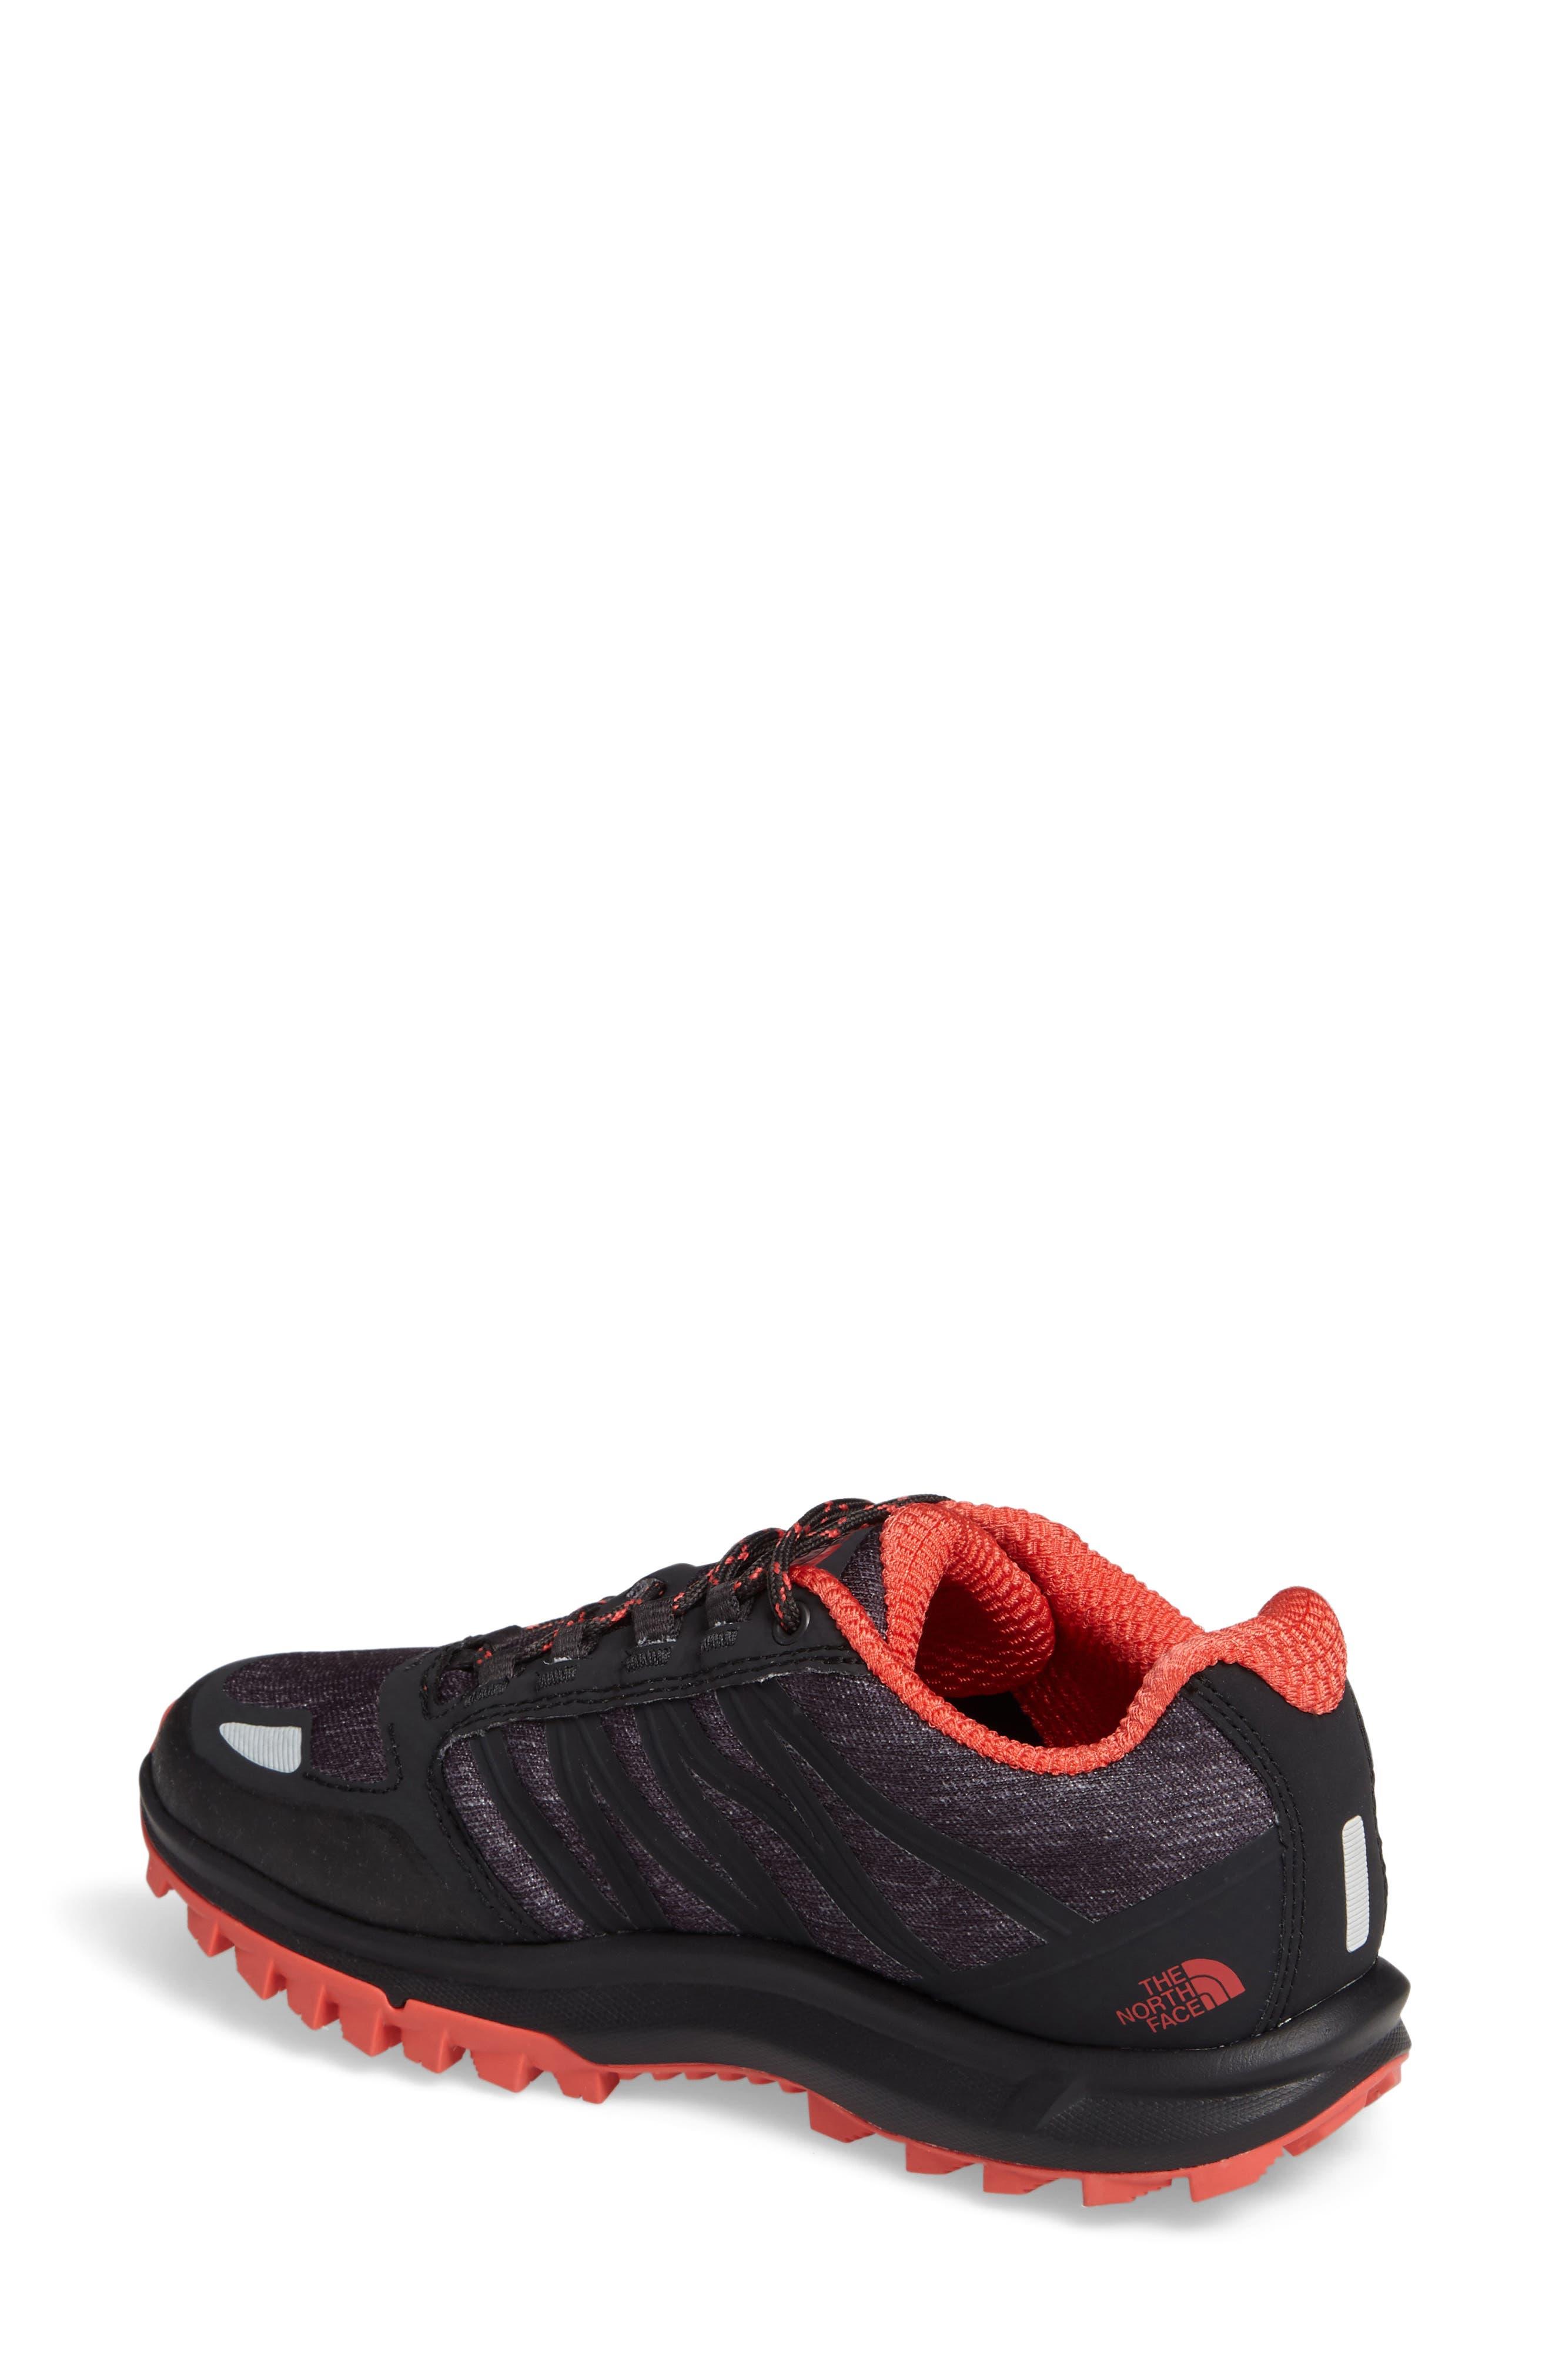 Litewave II Trail Running Shoe,                             Alternate thumbnail 2, color,                             001